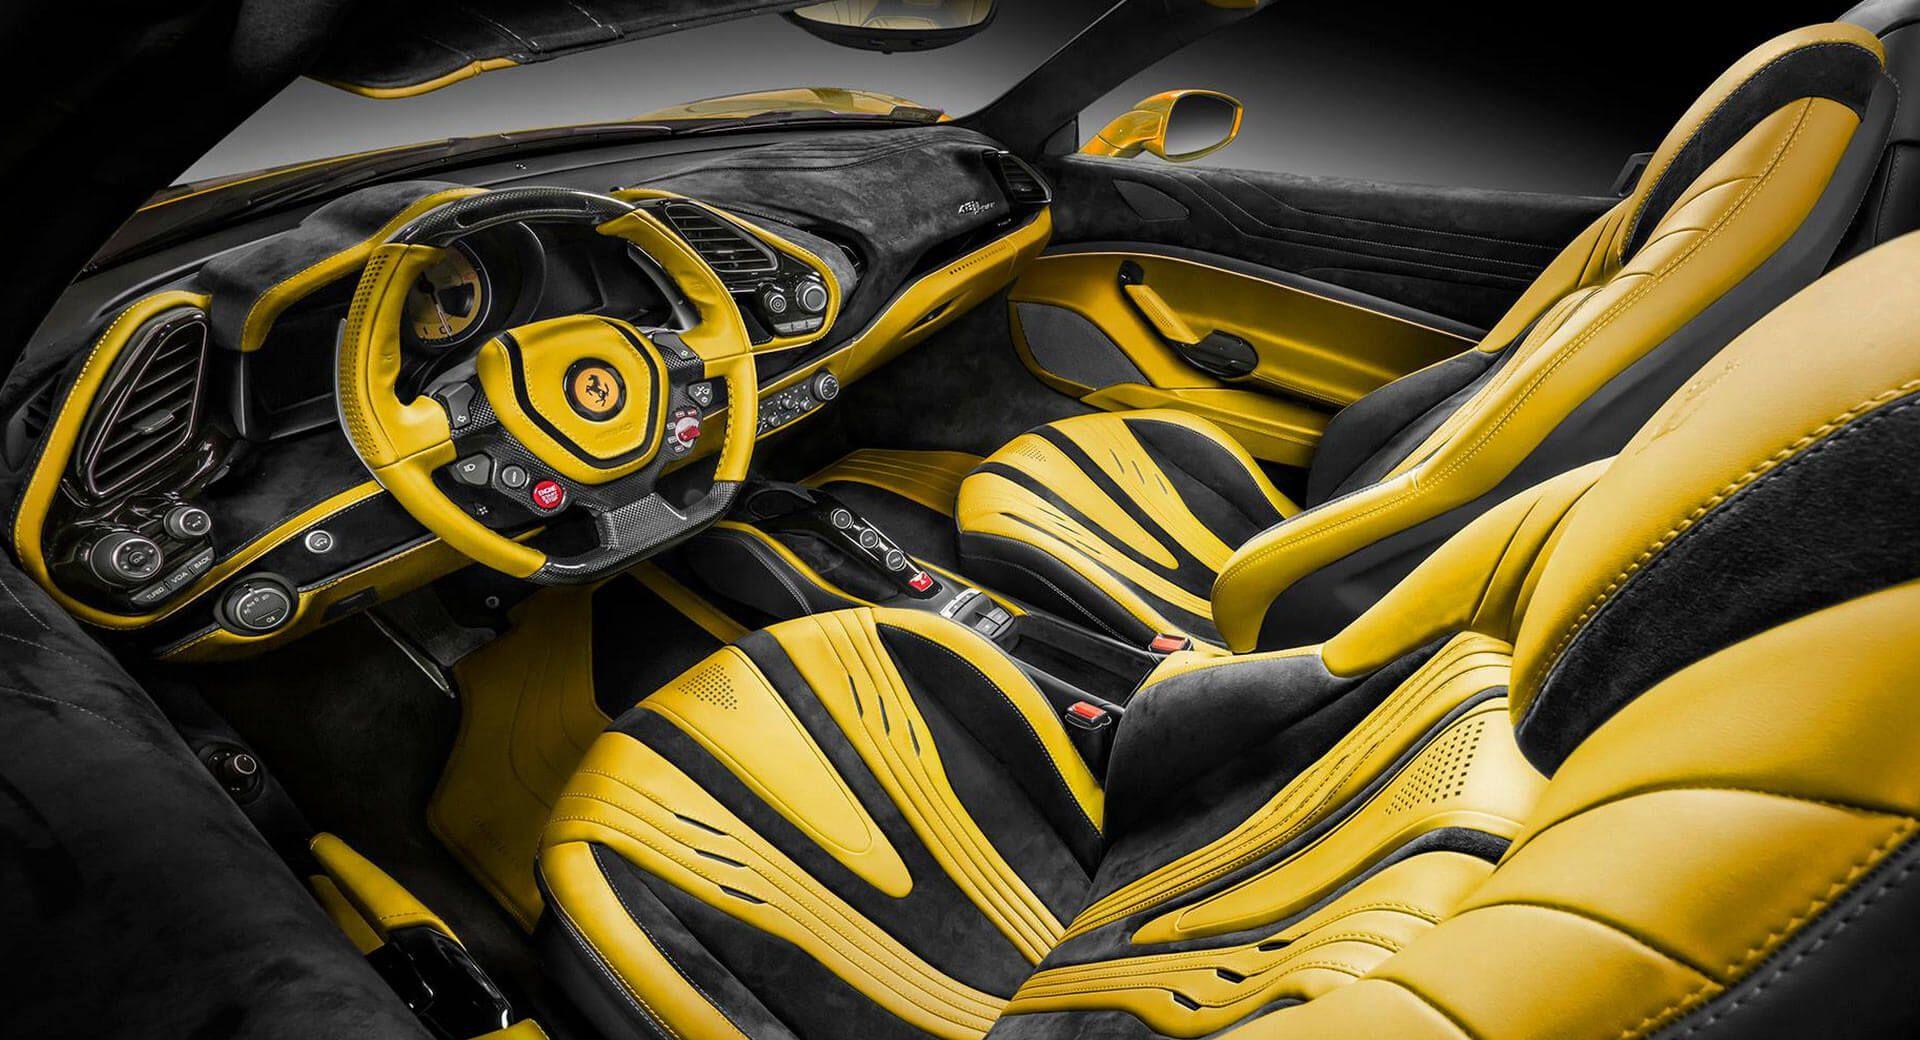 Latest Ferrari 488 Spider By Carlex Is All Yellow Leather And Alcantara Carscoops Latest Ferrari Ferrari Leather Car Seat Covers